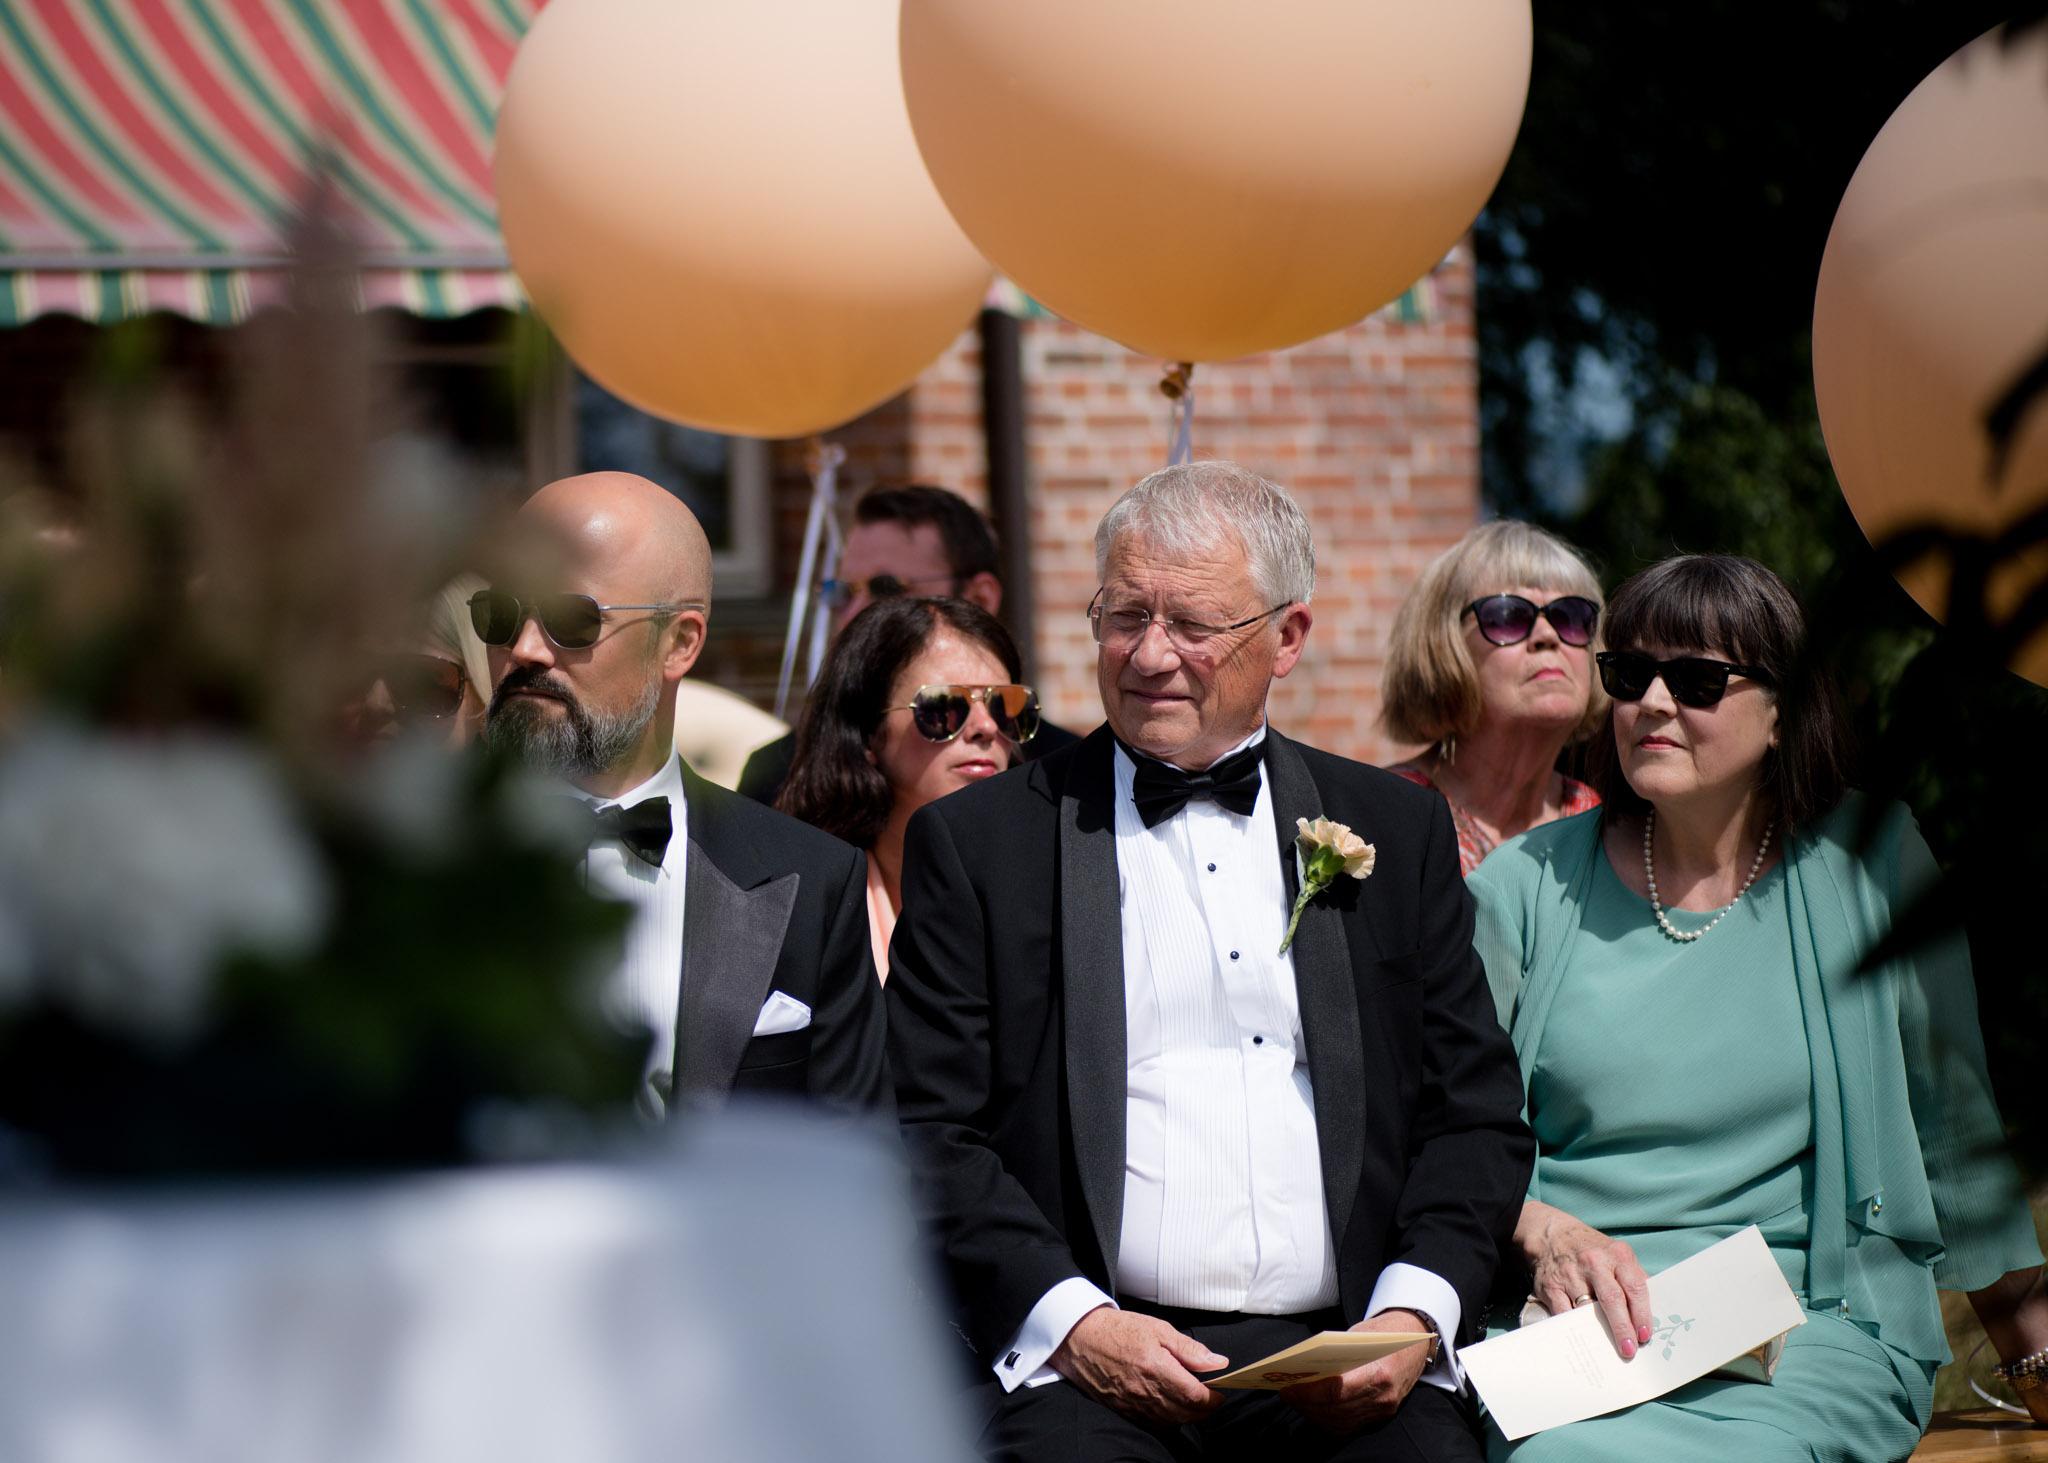 bryllupsfotograf-tønsberg-nøtterøy-fotograf-tjøme-vestfold-oslo-fotografvarpe--2878.JPG